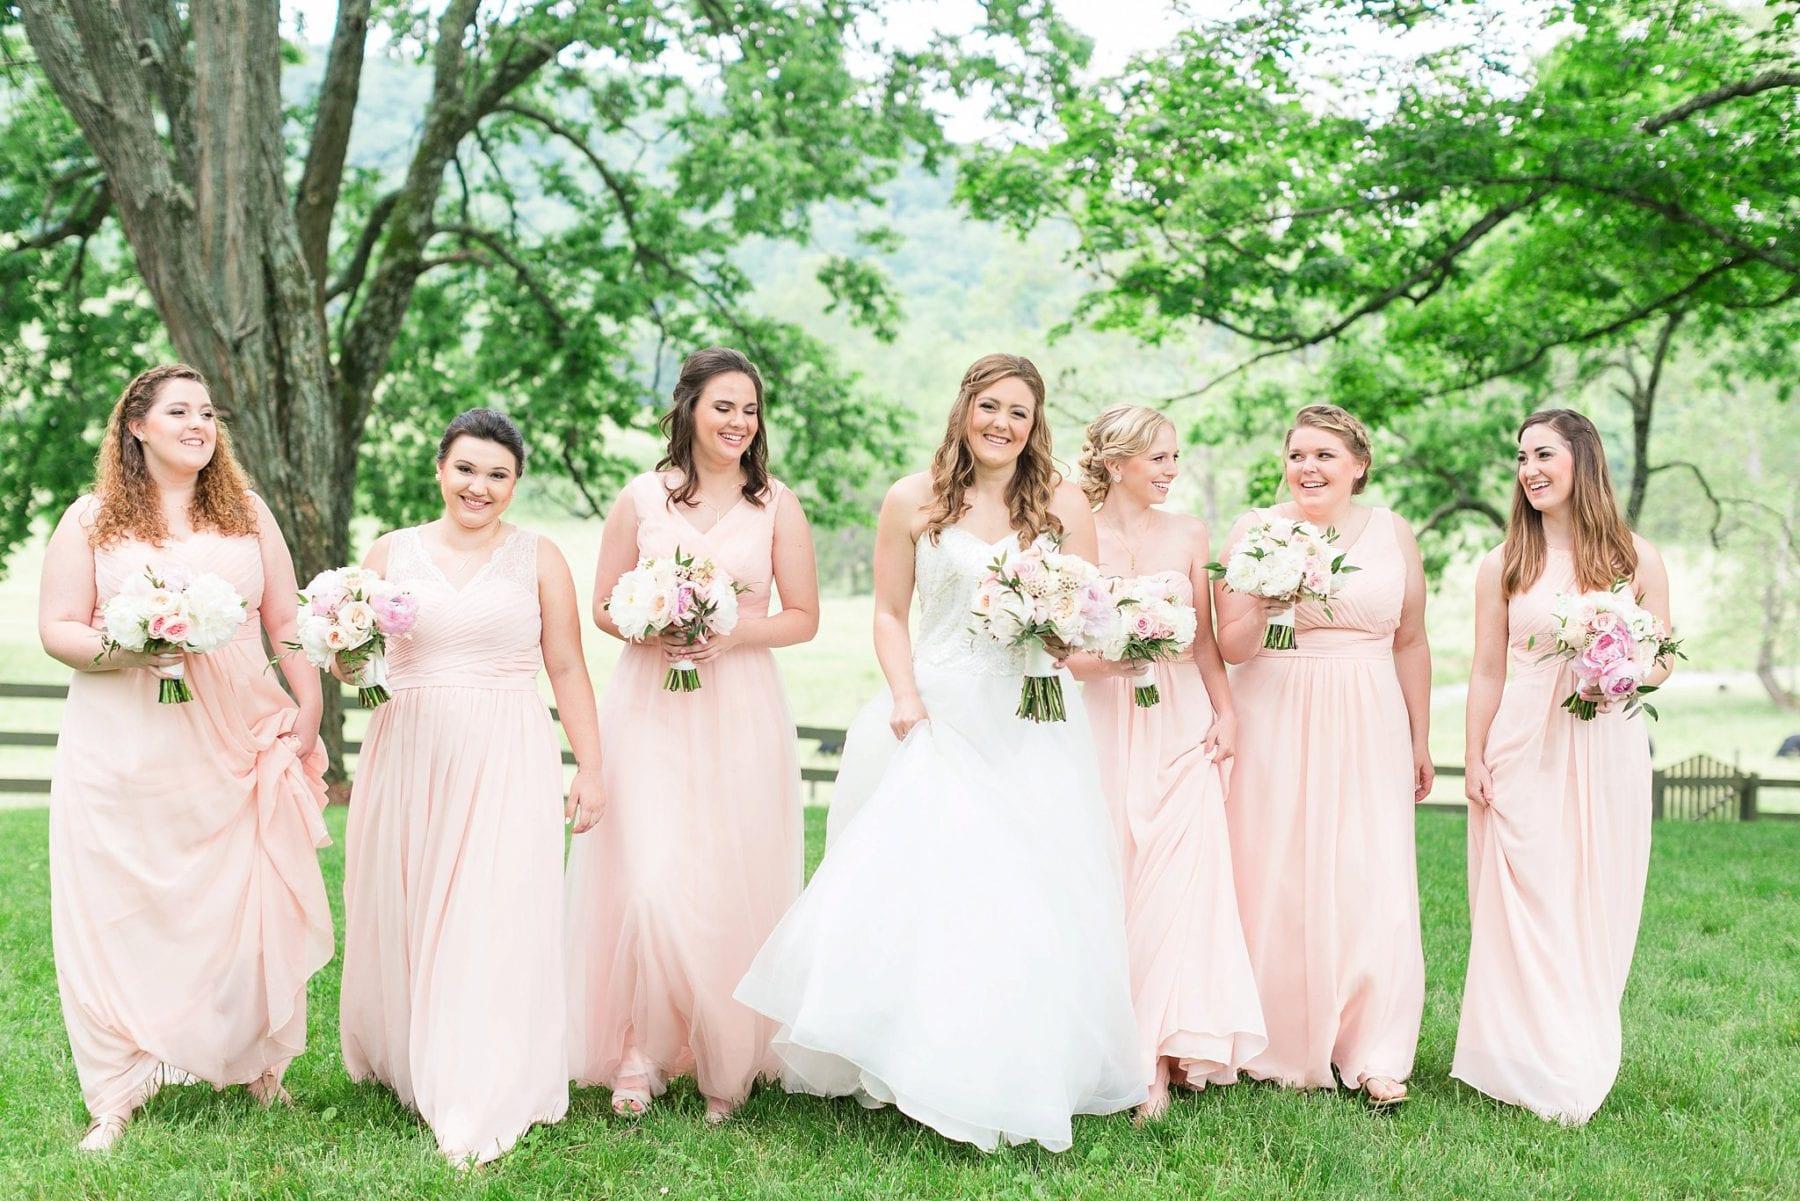 Justin & Megan Big Spring Farm Wedding Photos-156.jpg